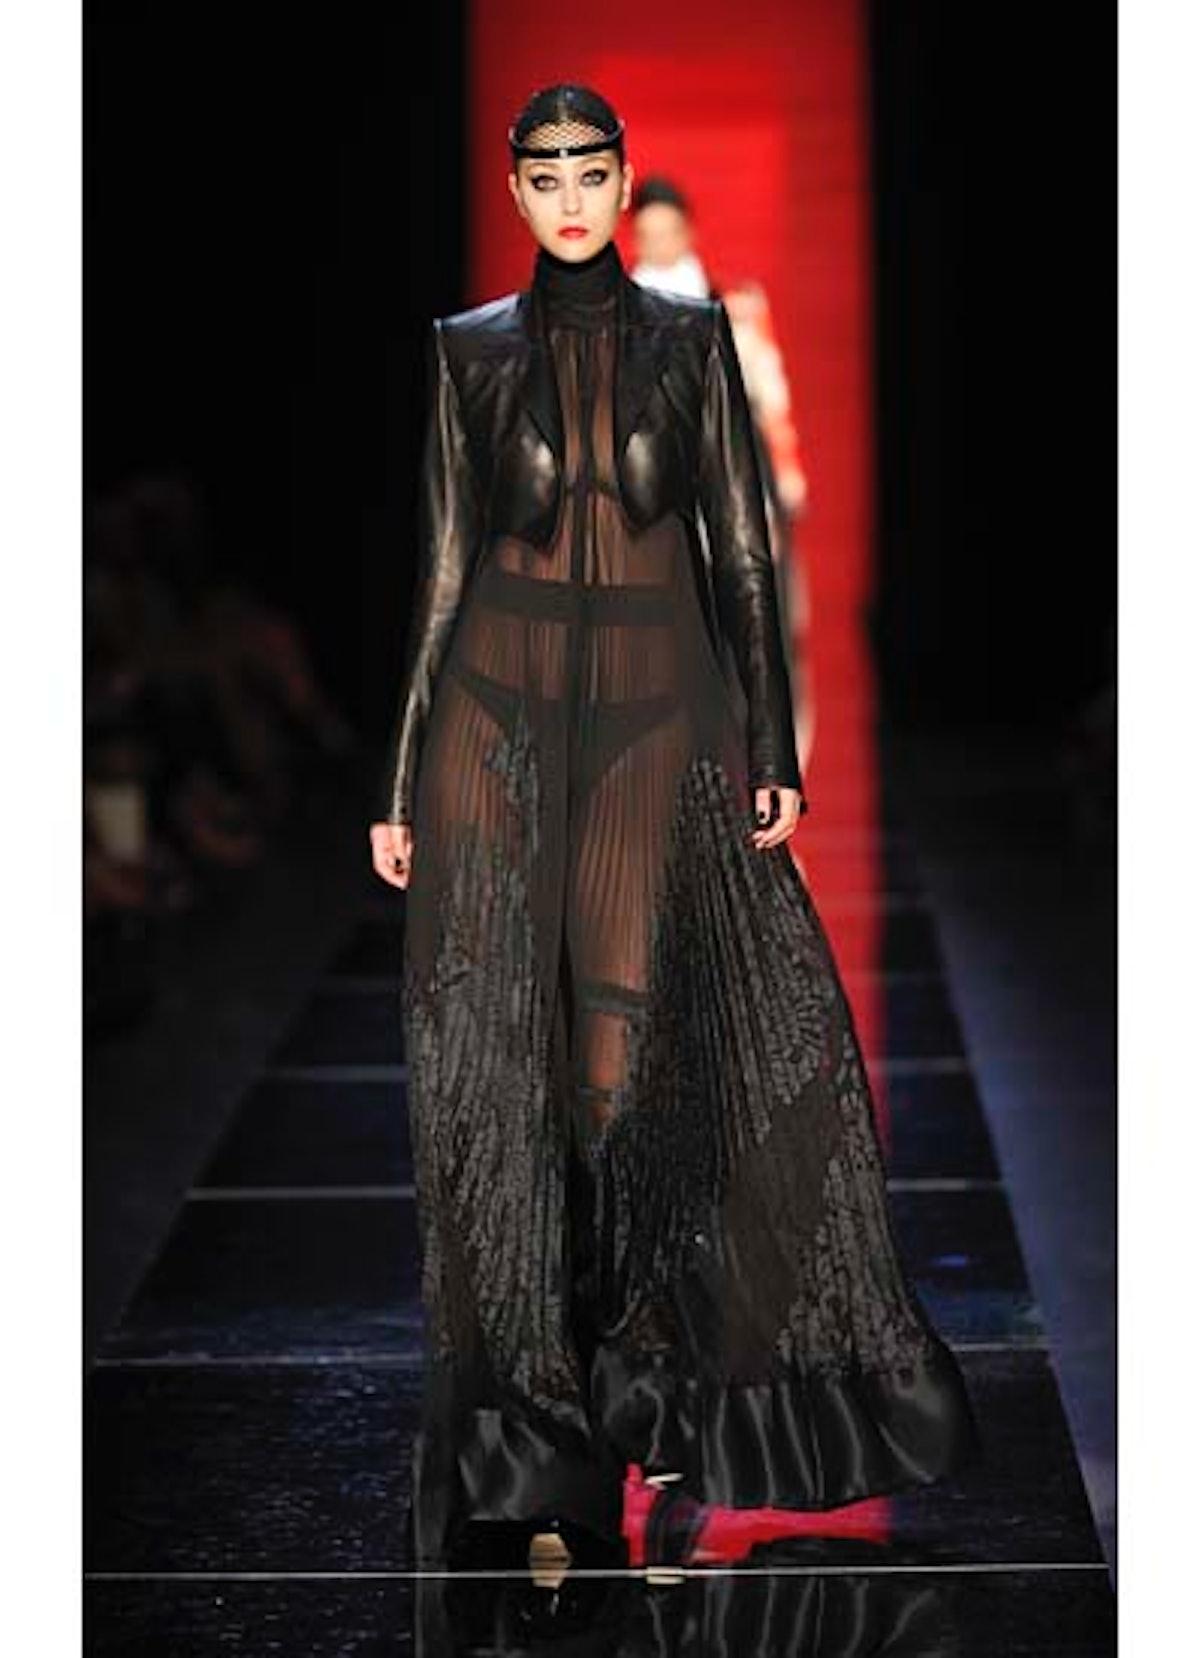 fass-jean-paul-gaultier-couture-2012-runway-34-v.jpg